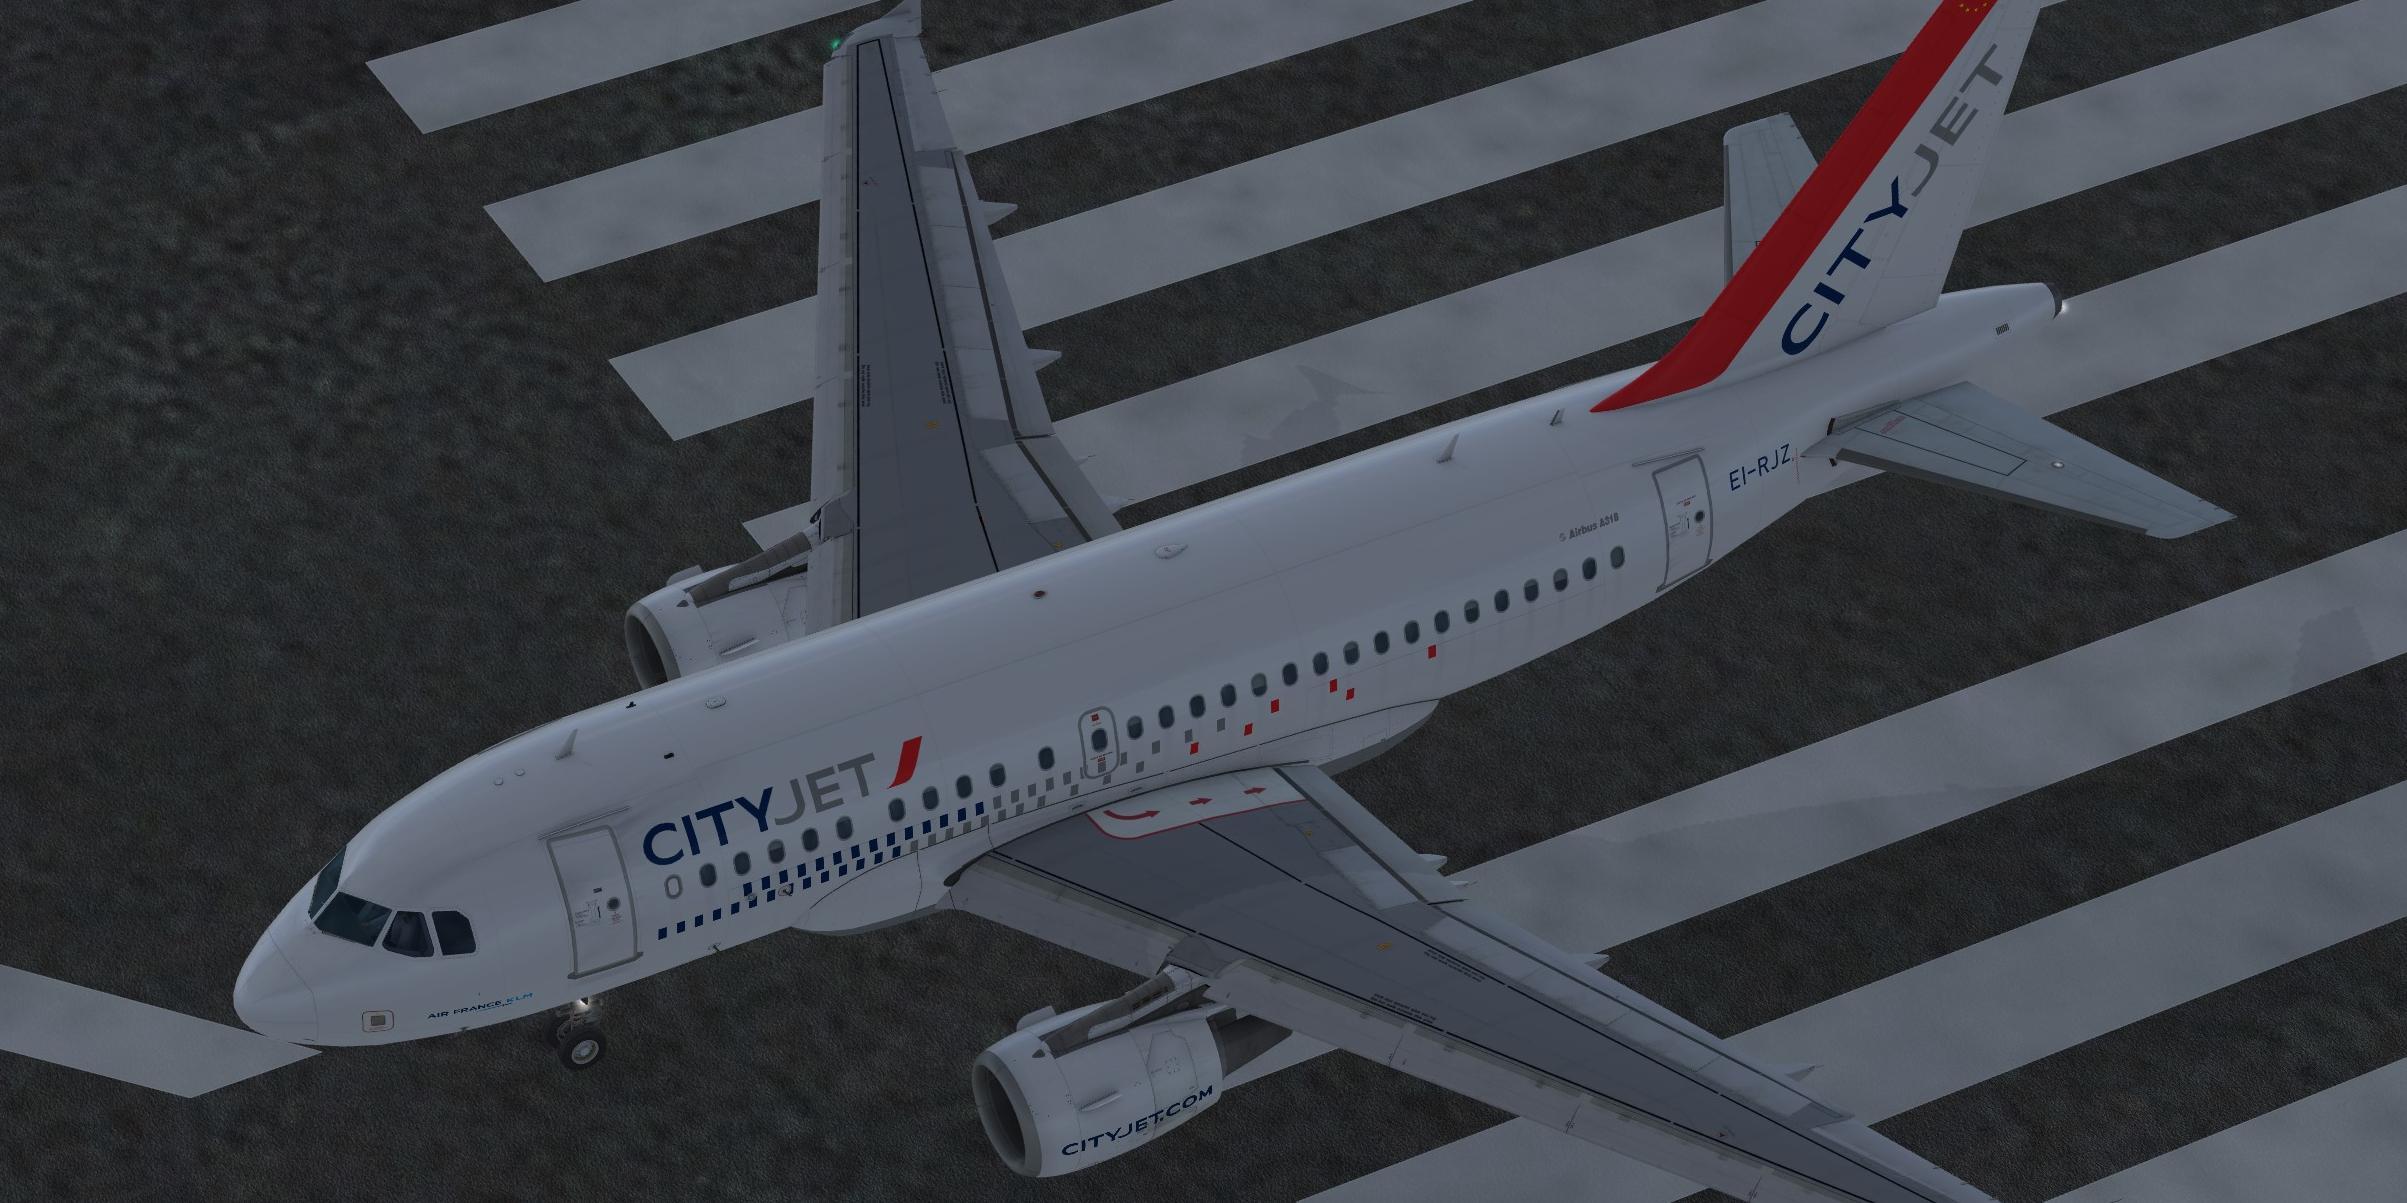 CityJet (fictional) Airbus A318-111 CFM